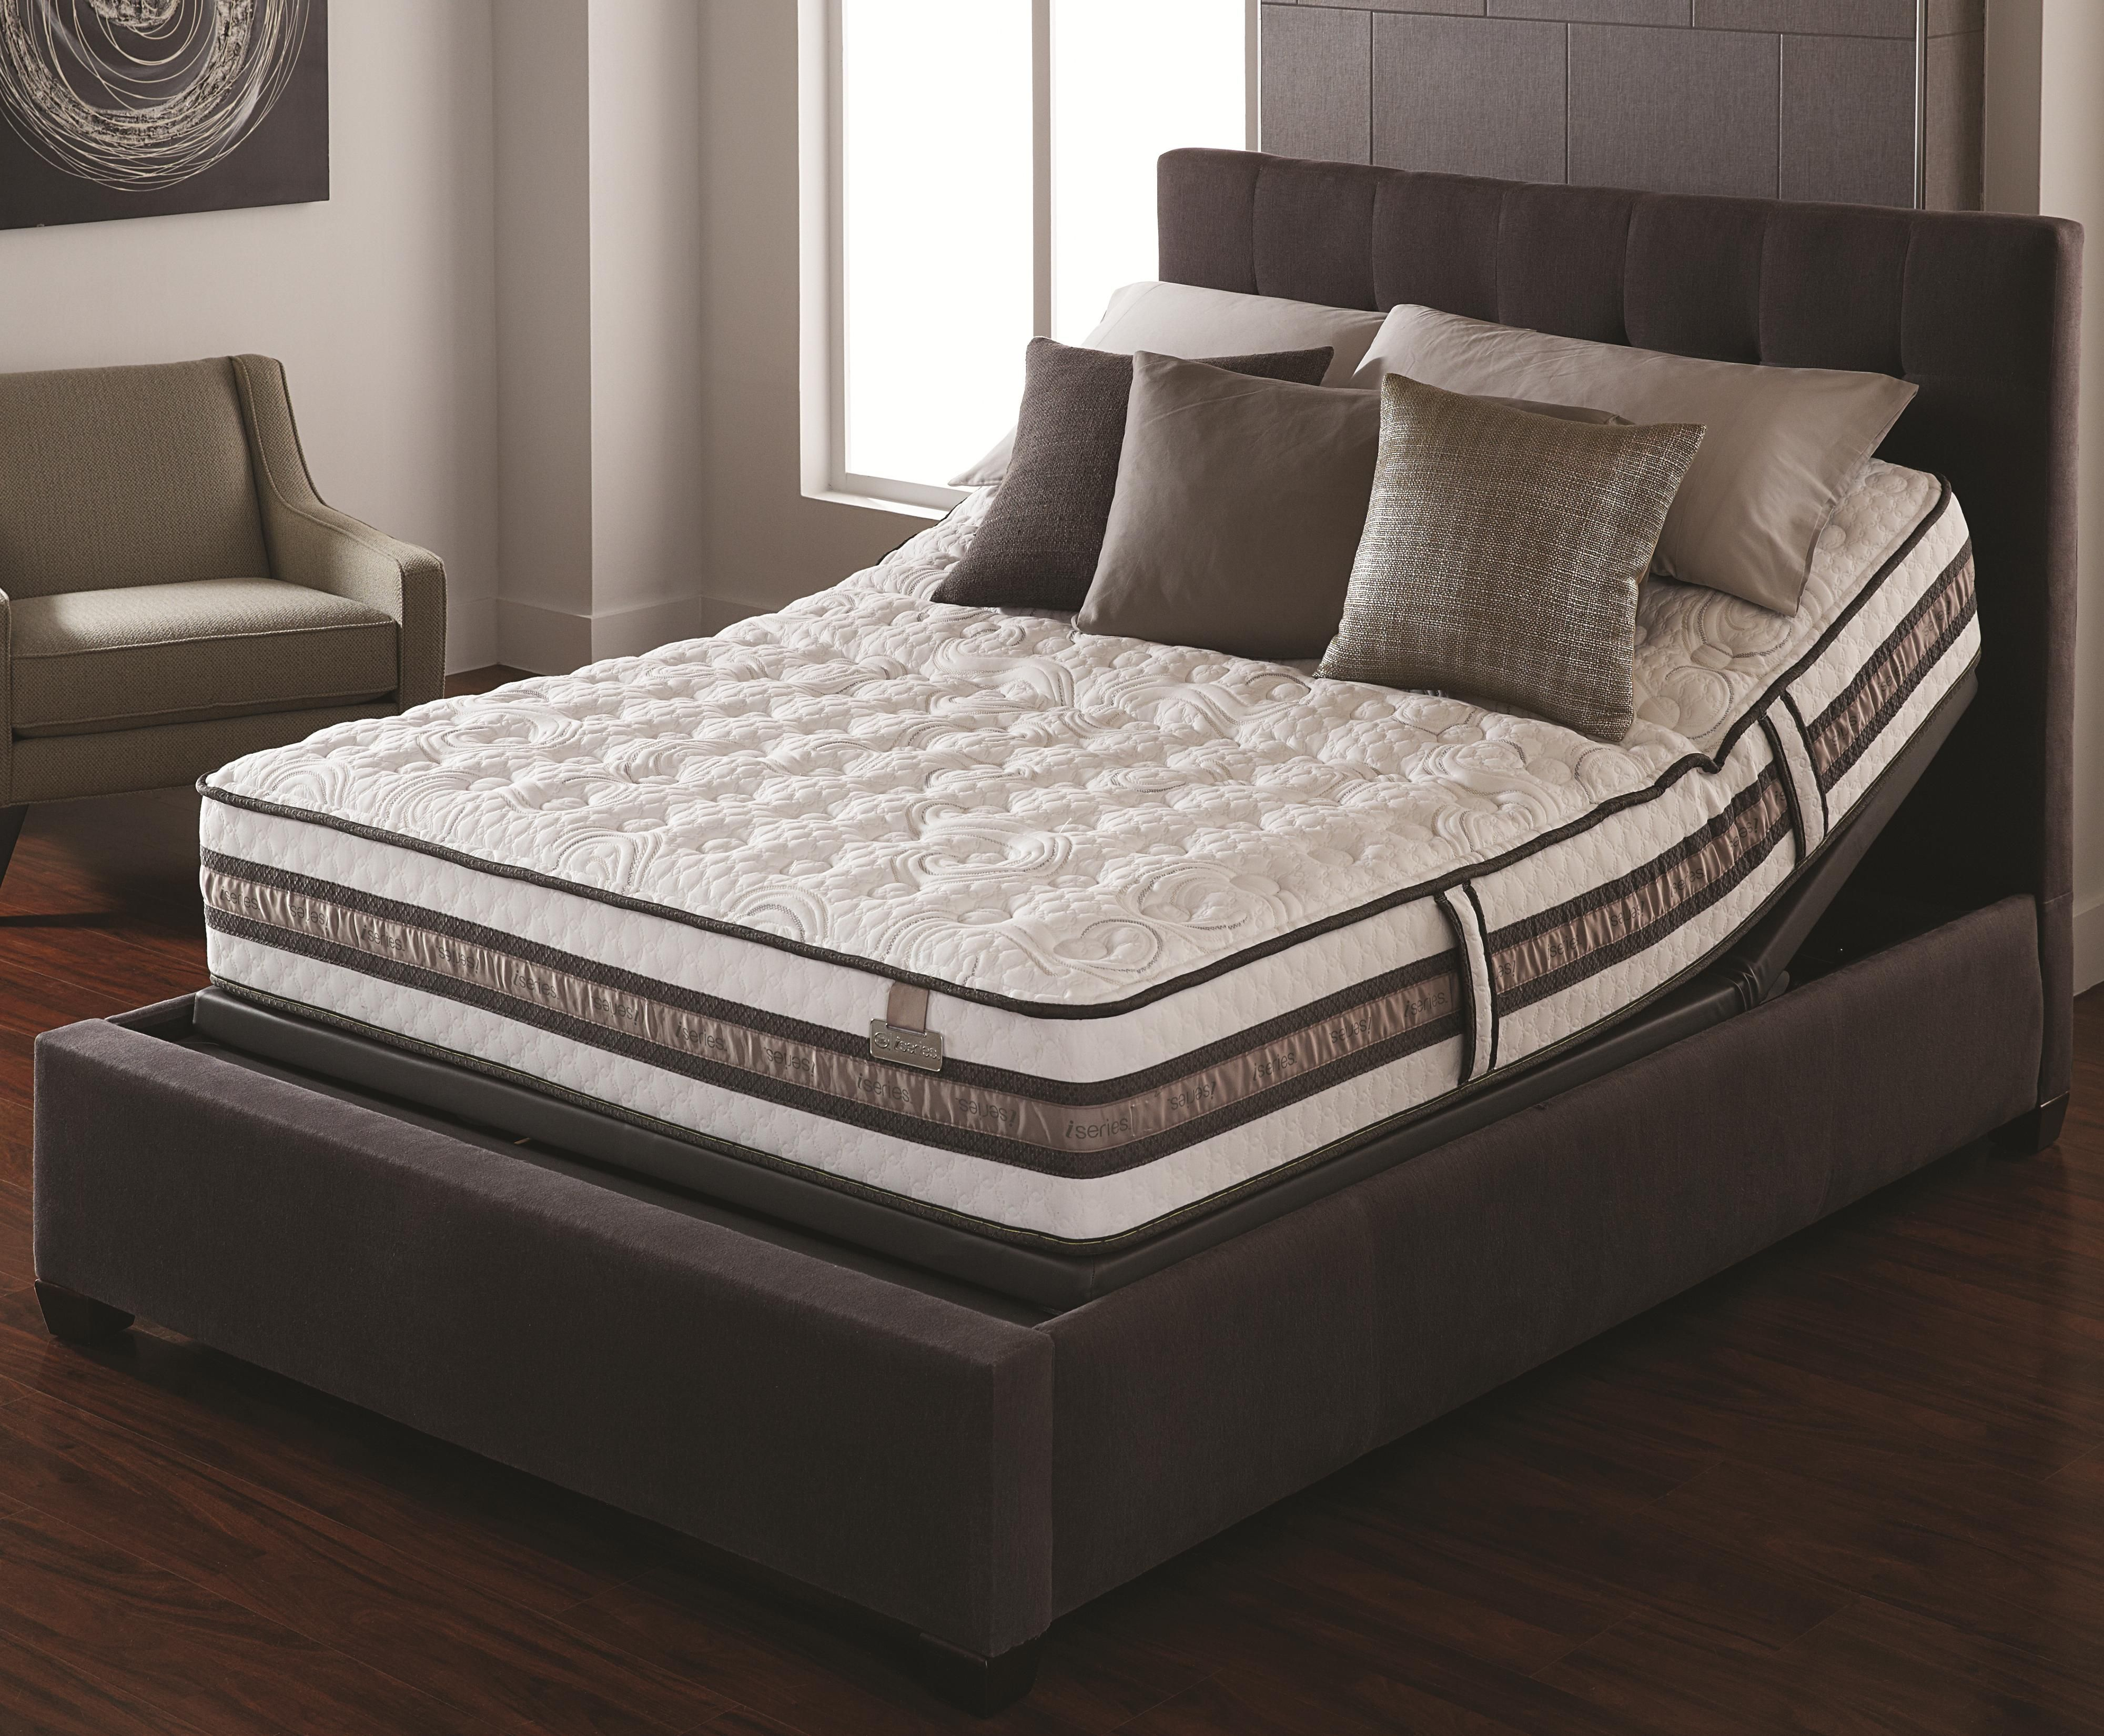 iseries expression queen firm mattress set by serta bedding